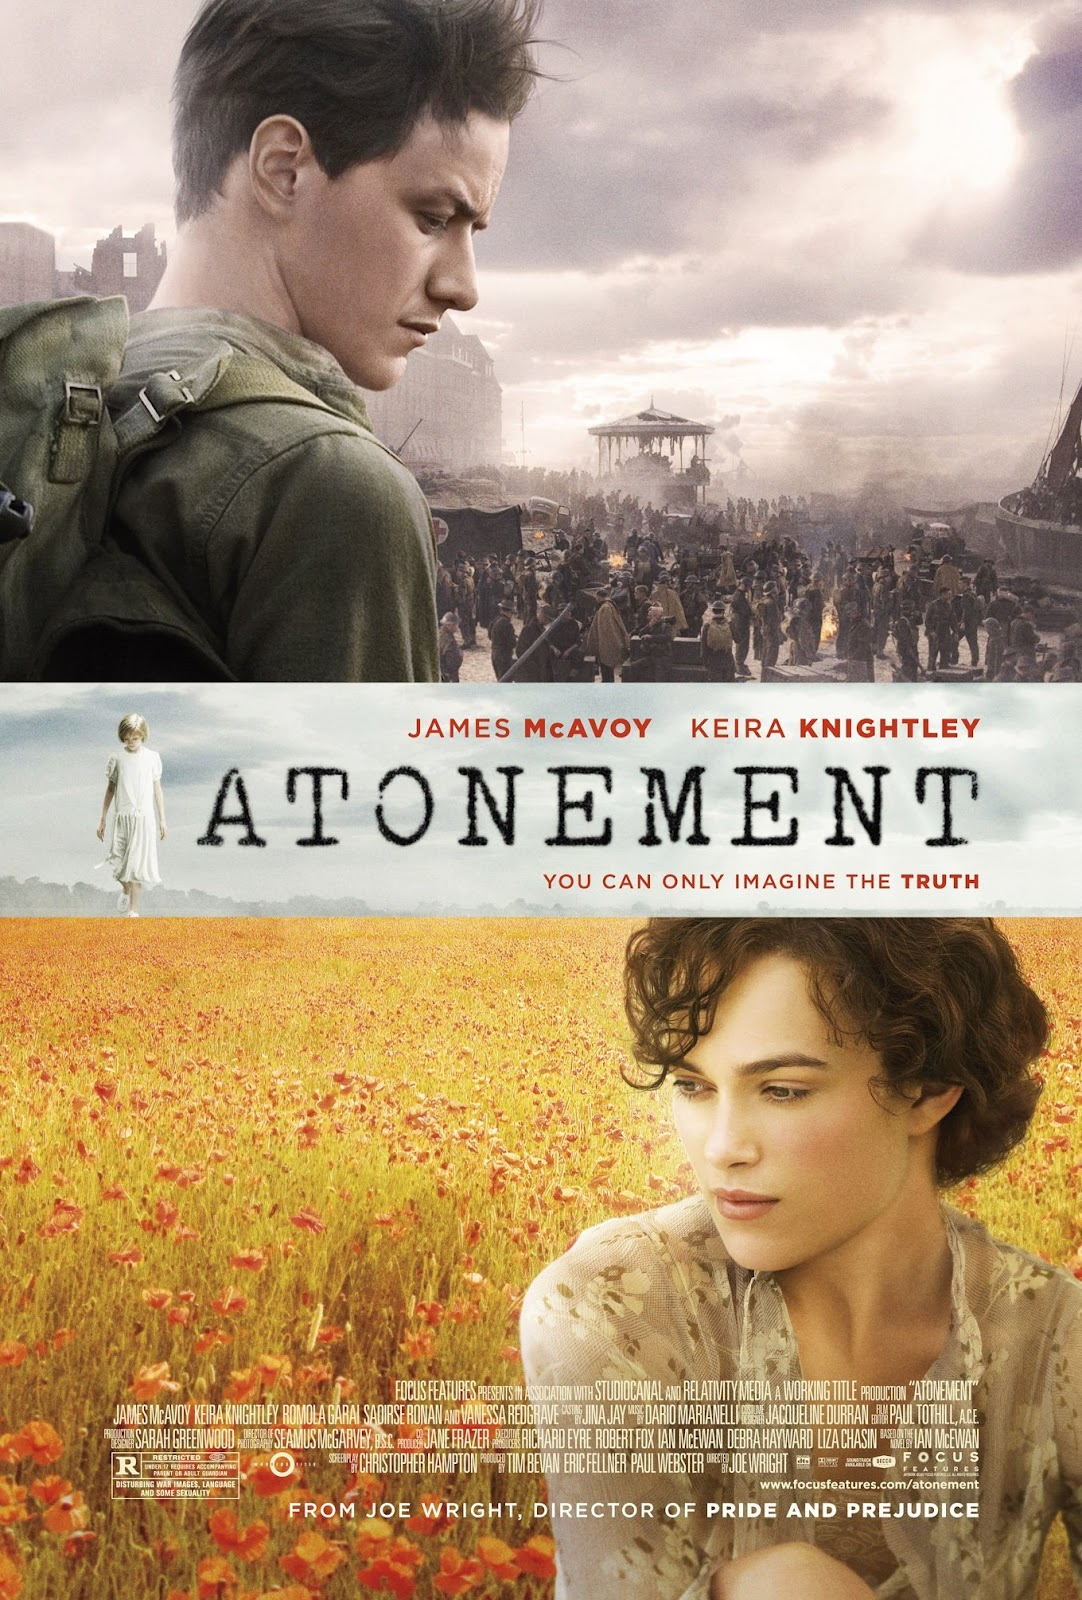 http://4.bp.blogspot.com/-D_bnzAggPoc/UBRW5VSmYaI/AAAAAAAACAE/LnGk5EreawI/s1600/Atonement+%282007%29+Movie+Poster.jpg